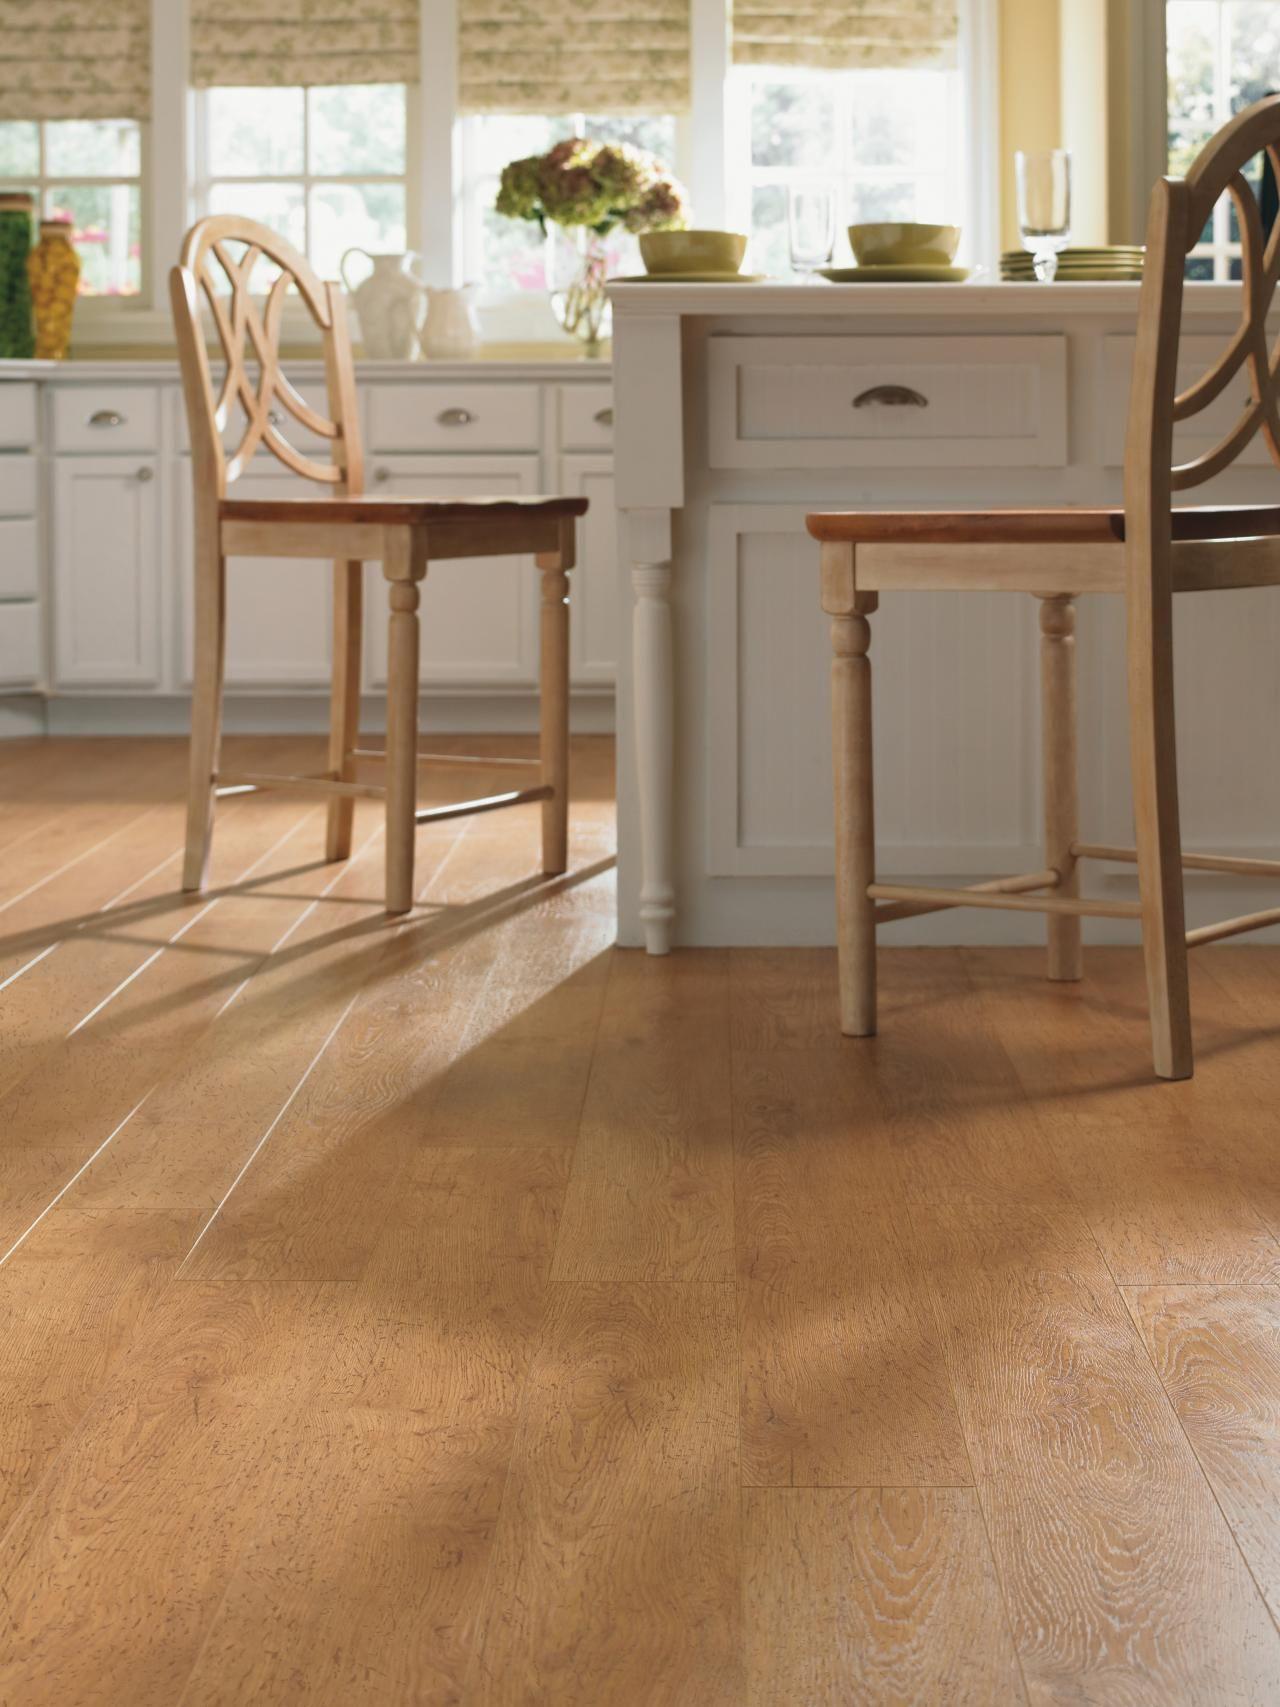 Laminate Flooring in the Kitchen | Kitchen laminate flooring ...